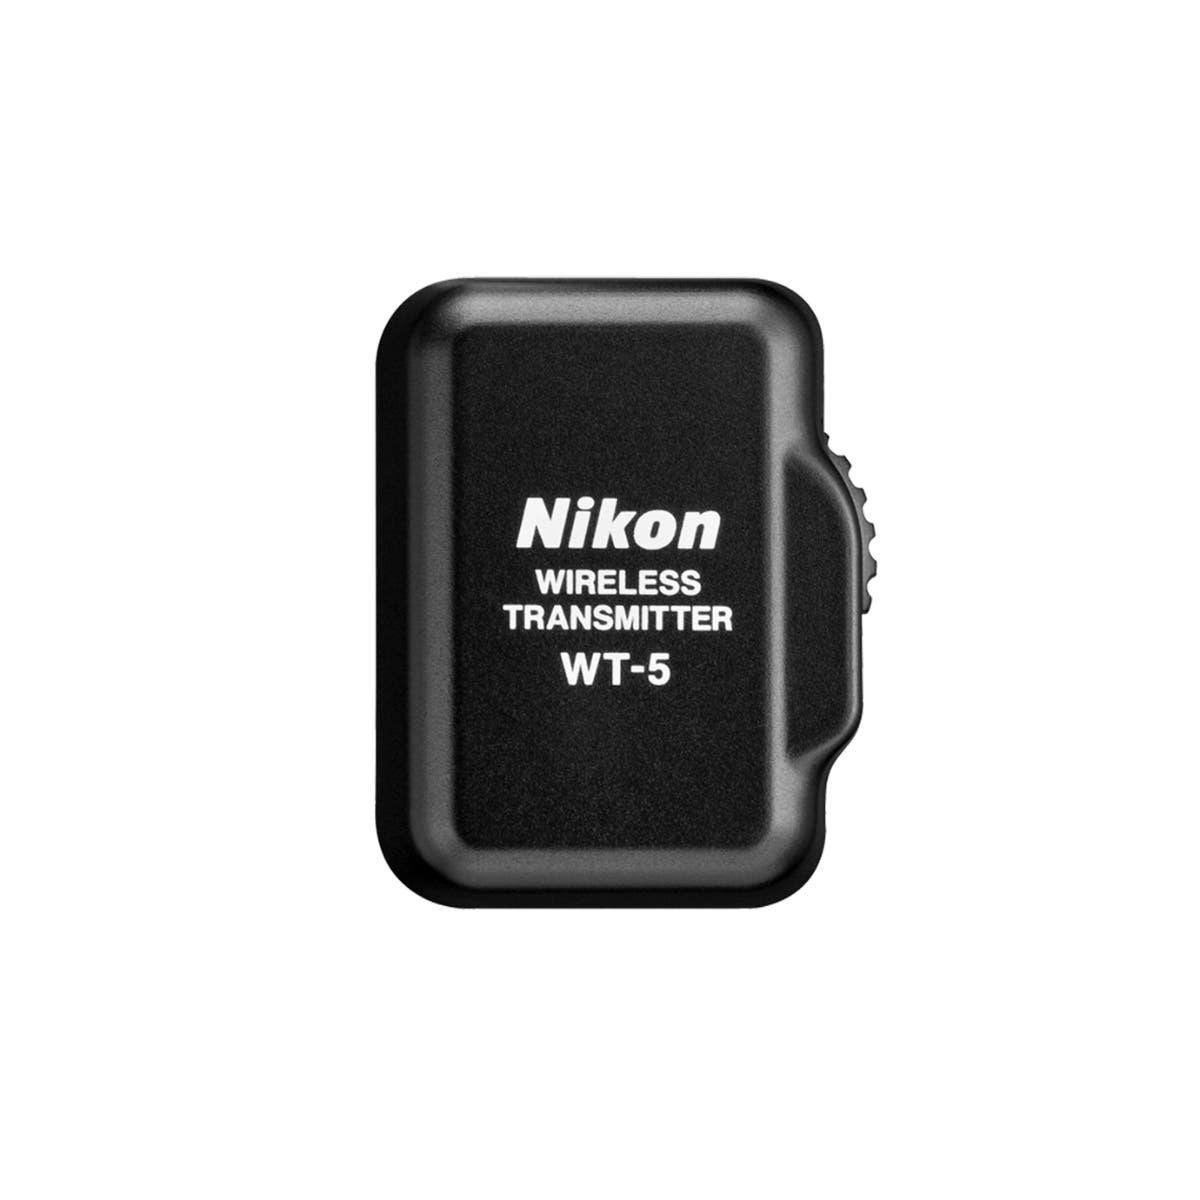 WT-5 Wireless Transmitter